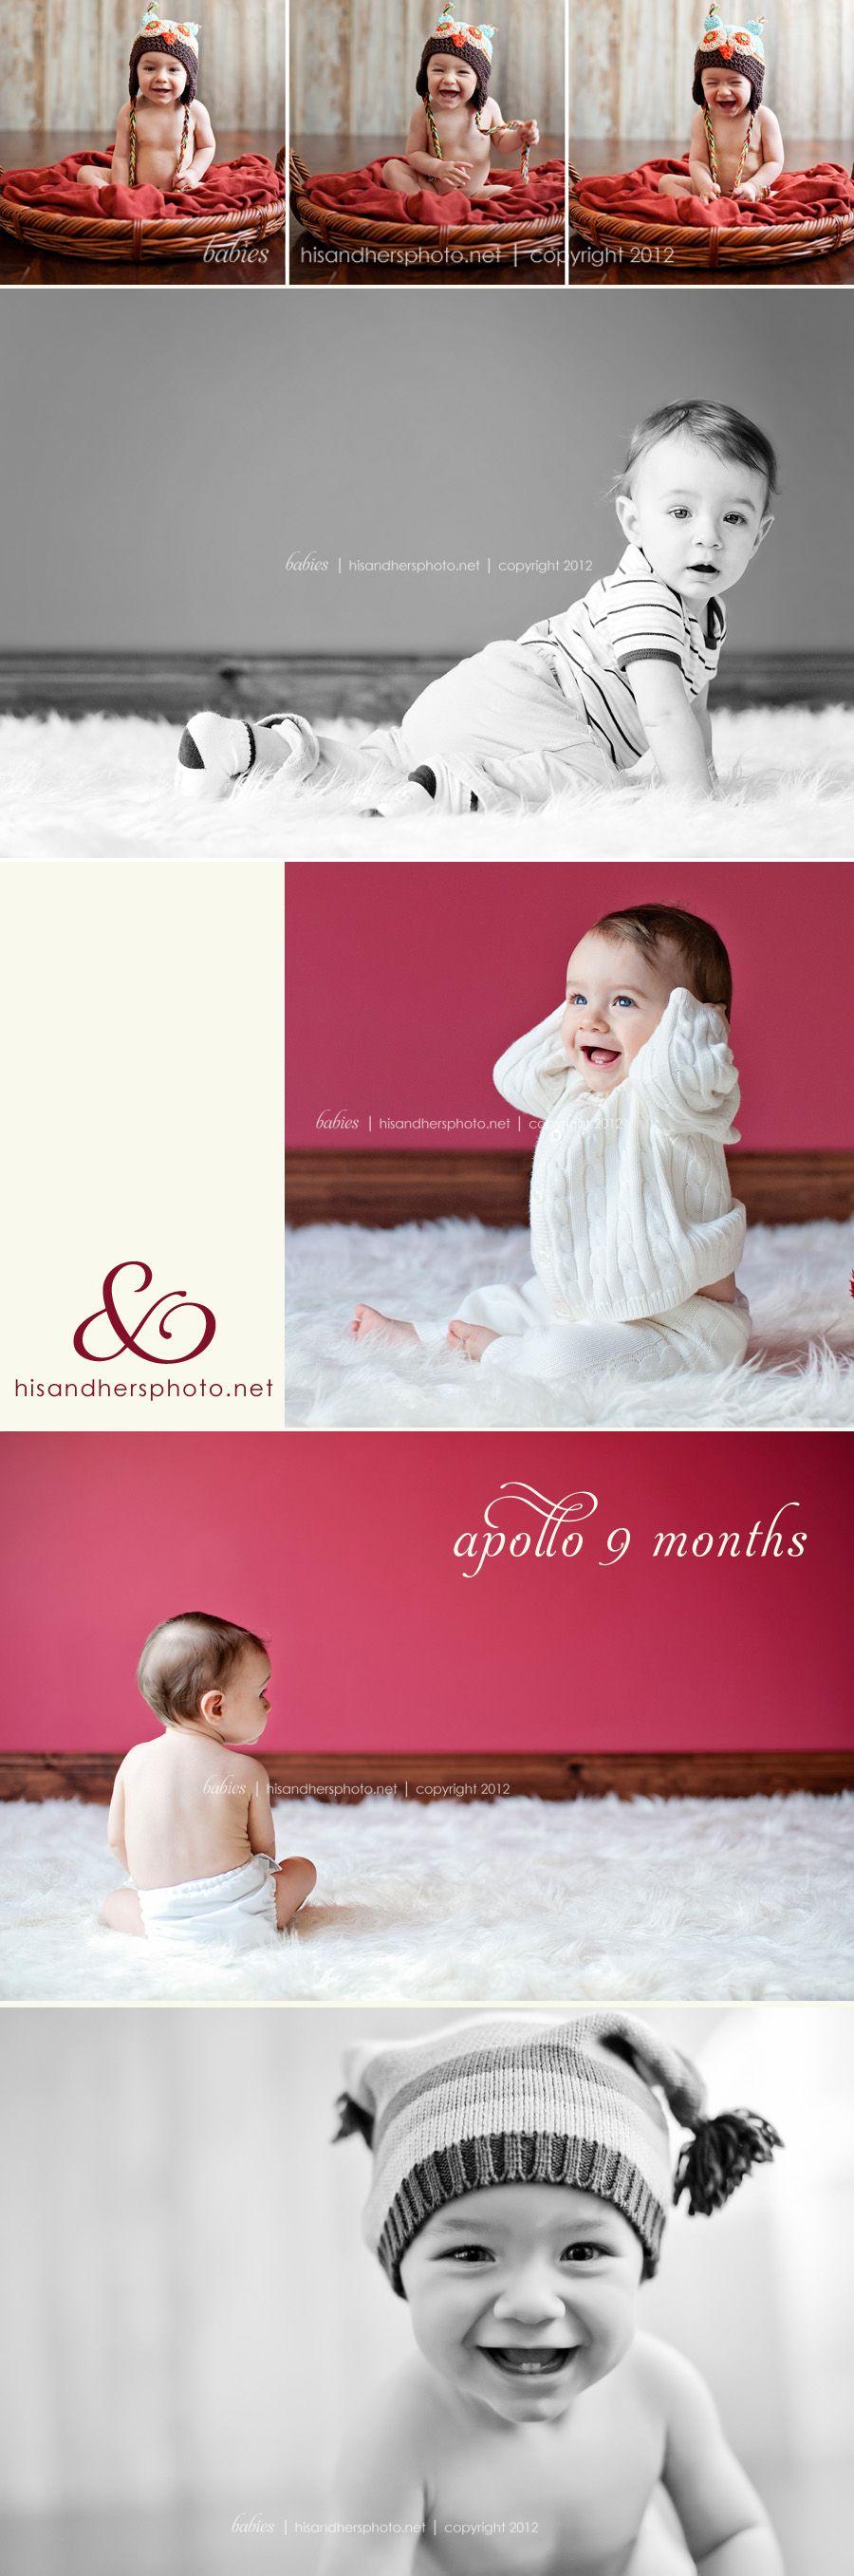 Des Moines, Iowa Baby Photographer   Apollo, 9 months old